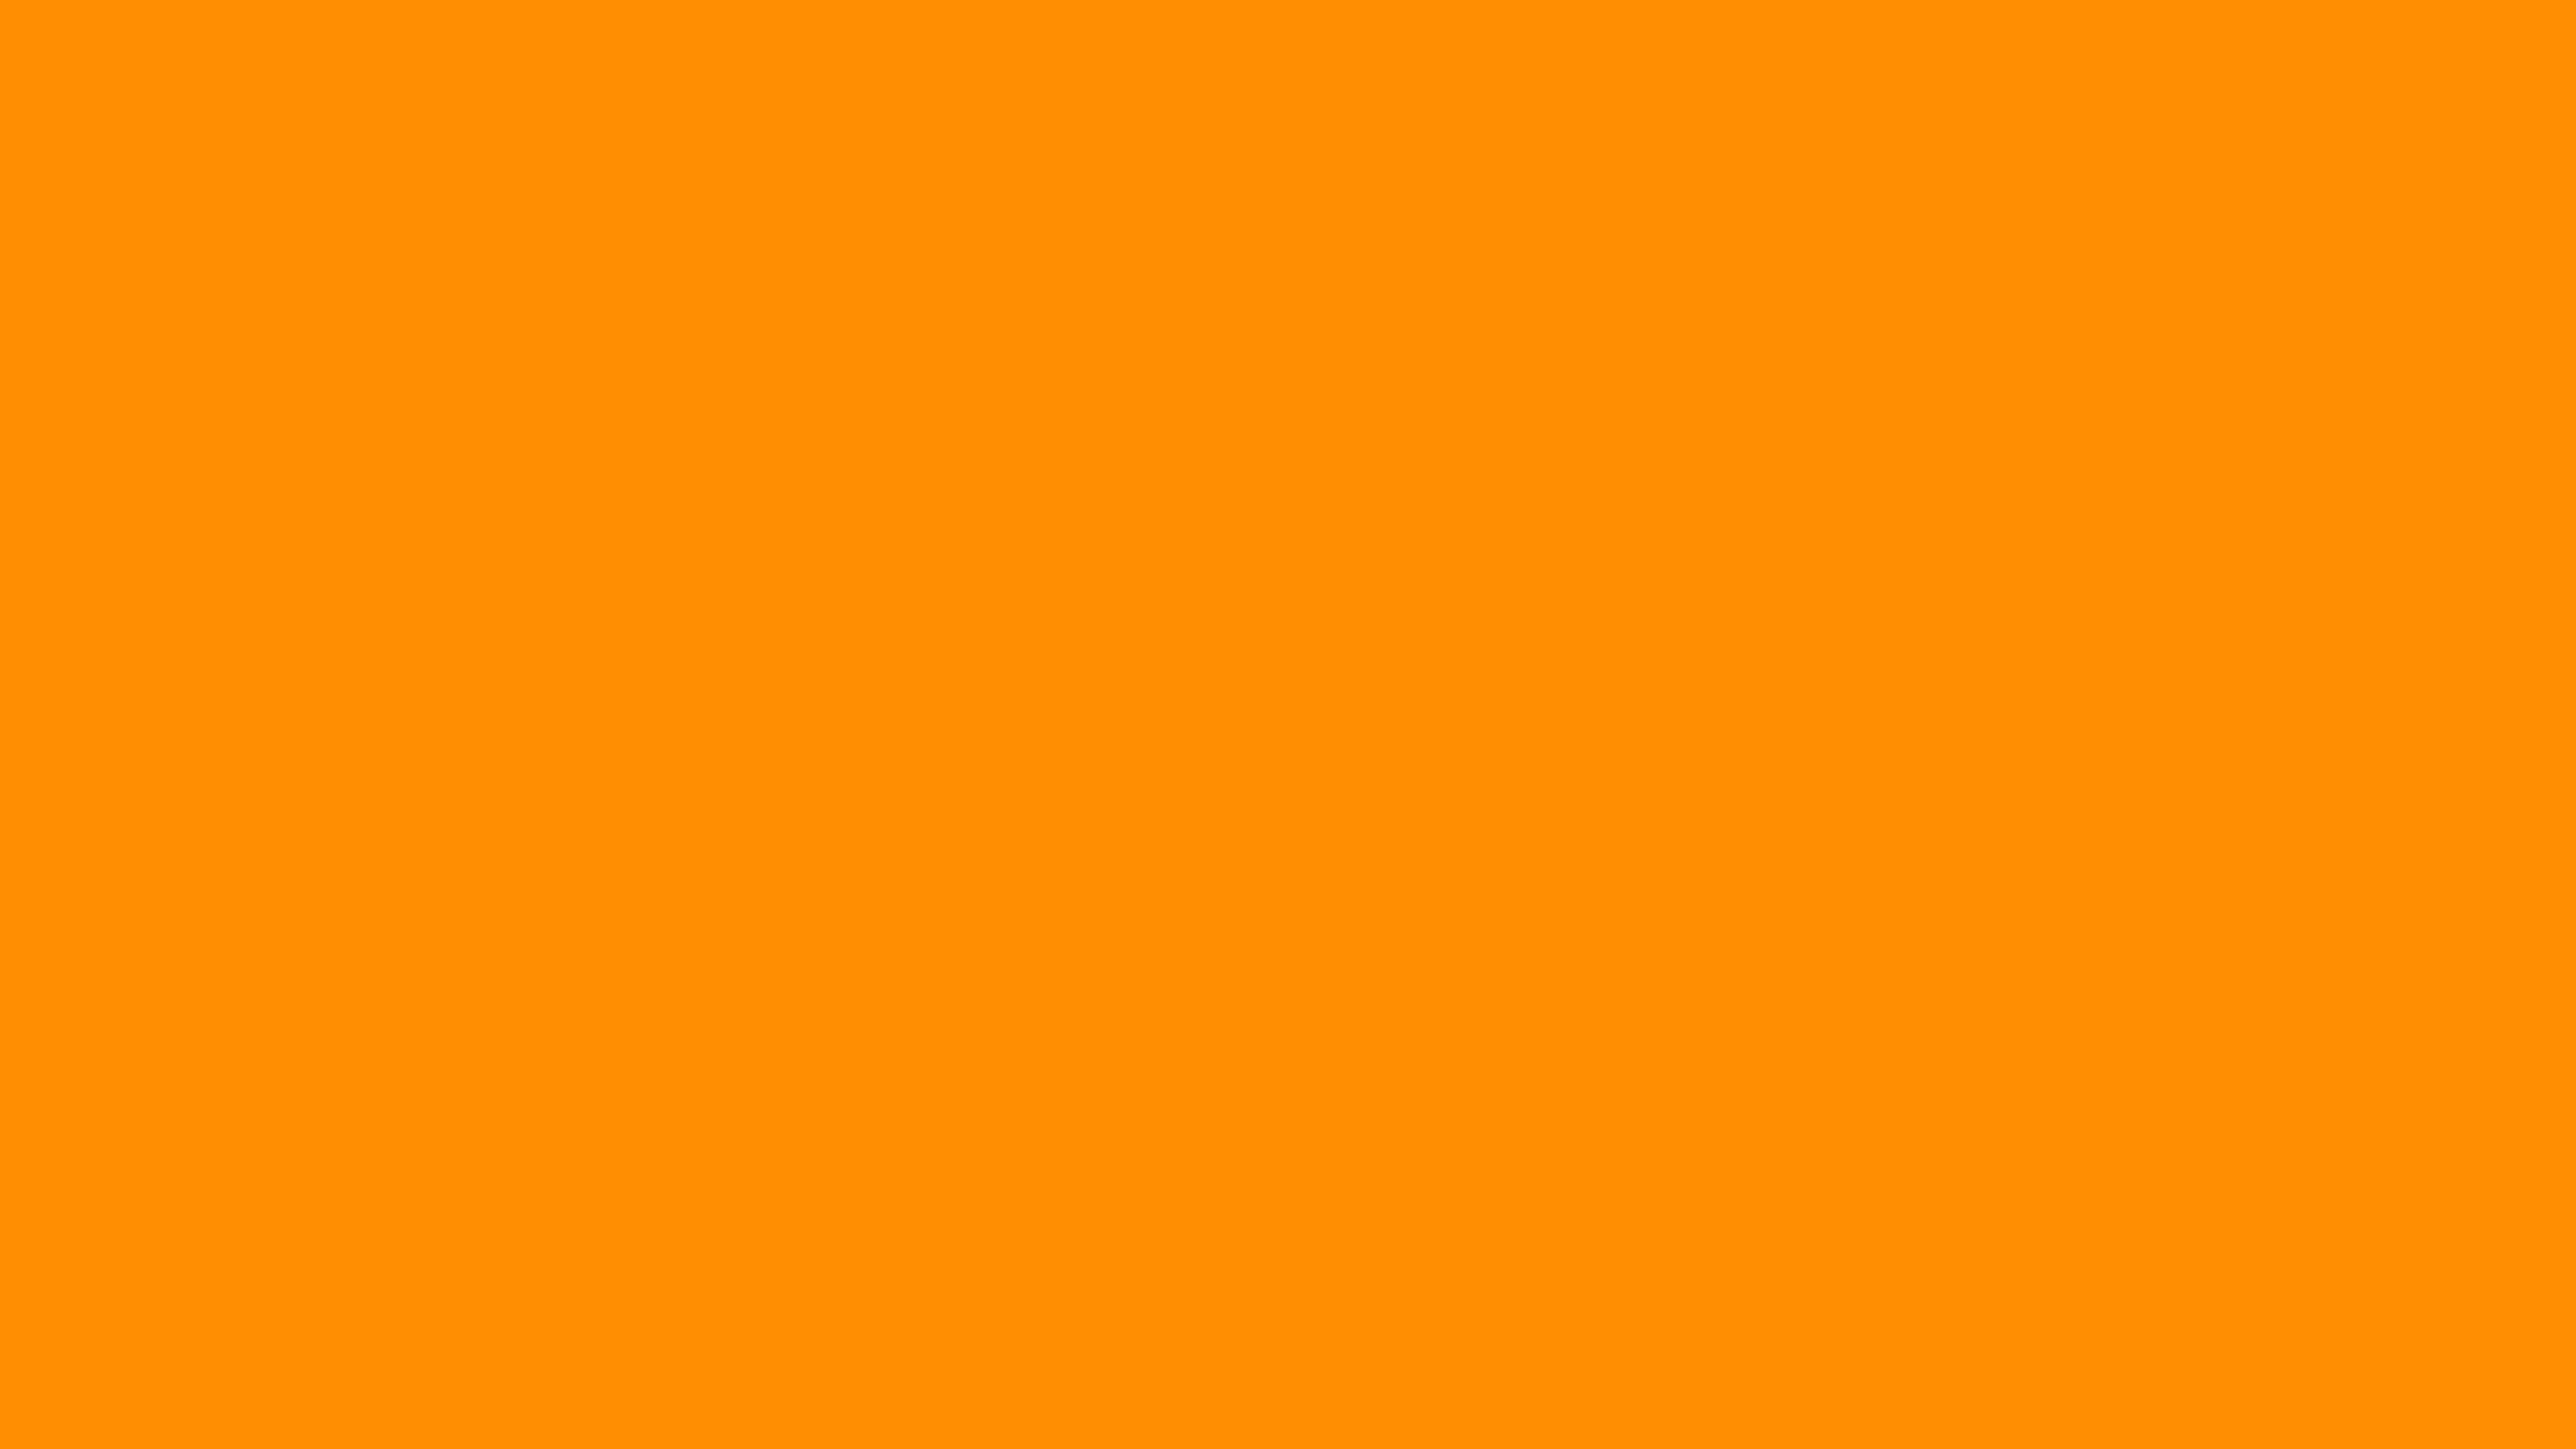 3840x2160 Princeton Orange Solid Color Background